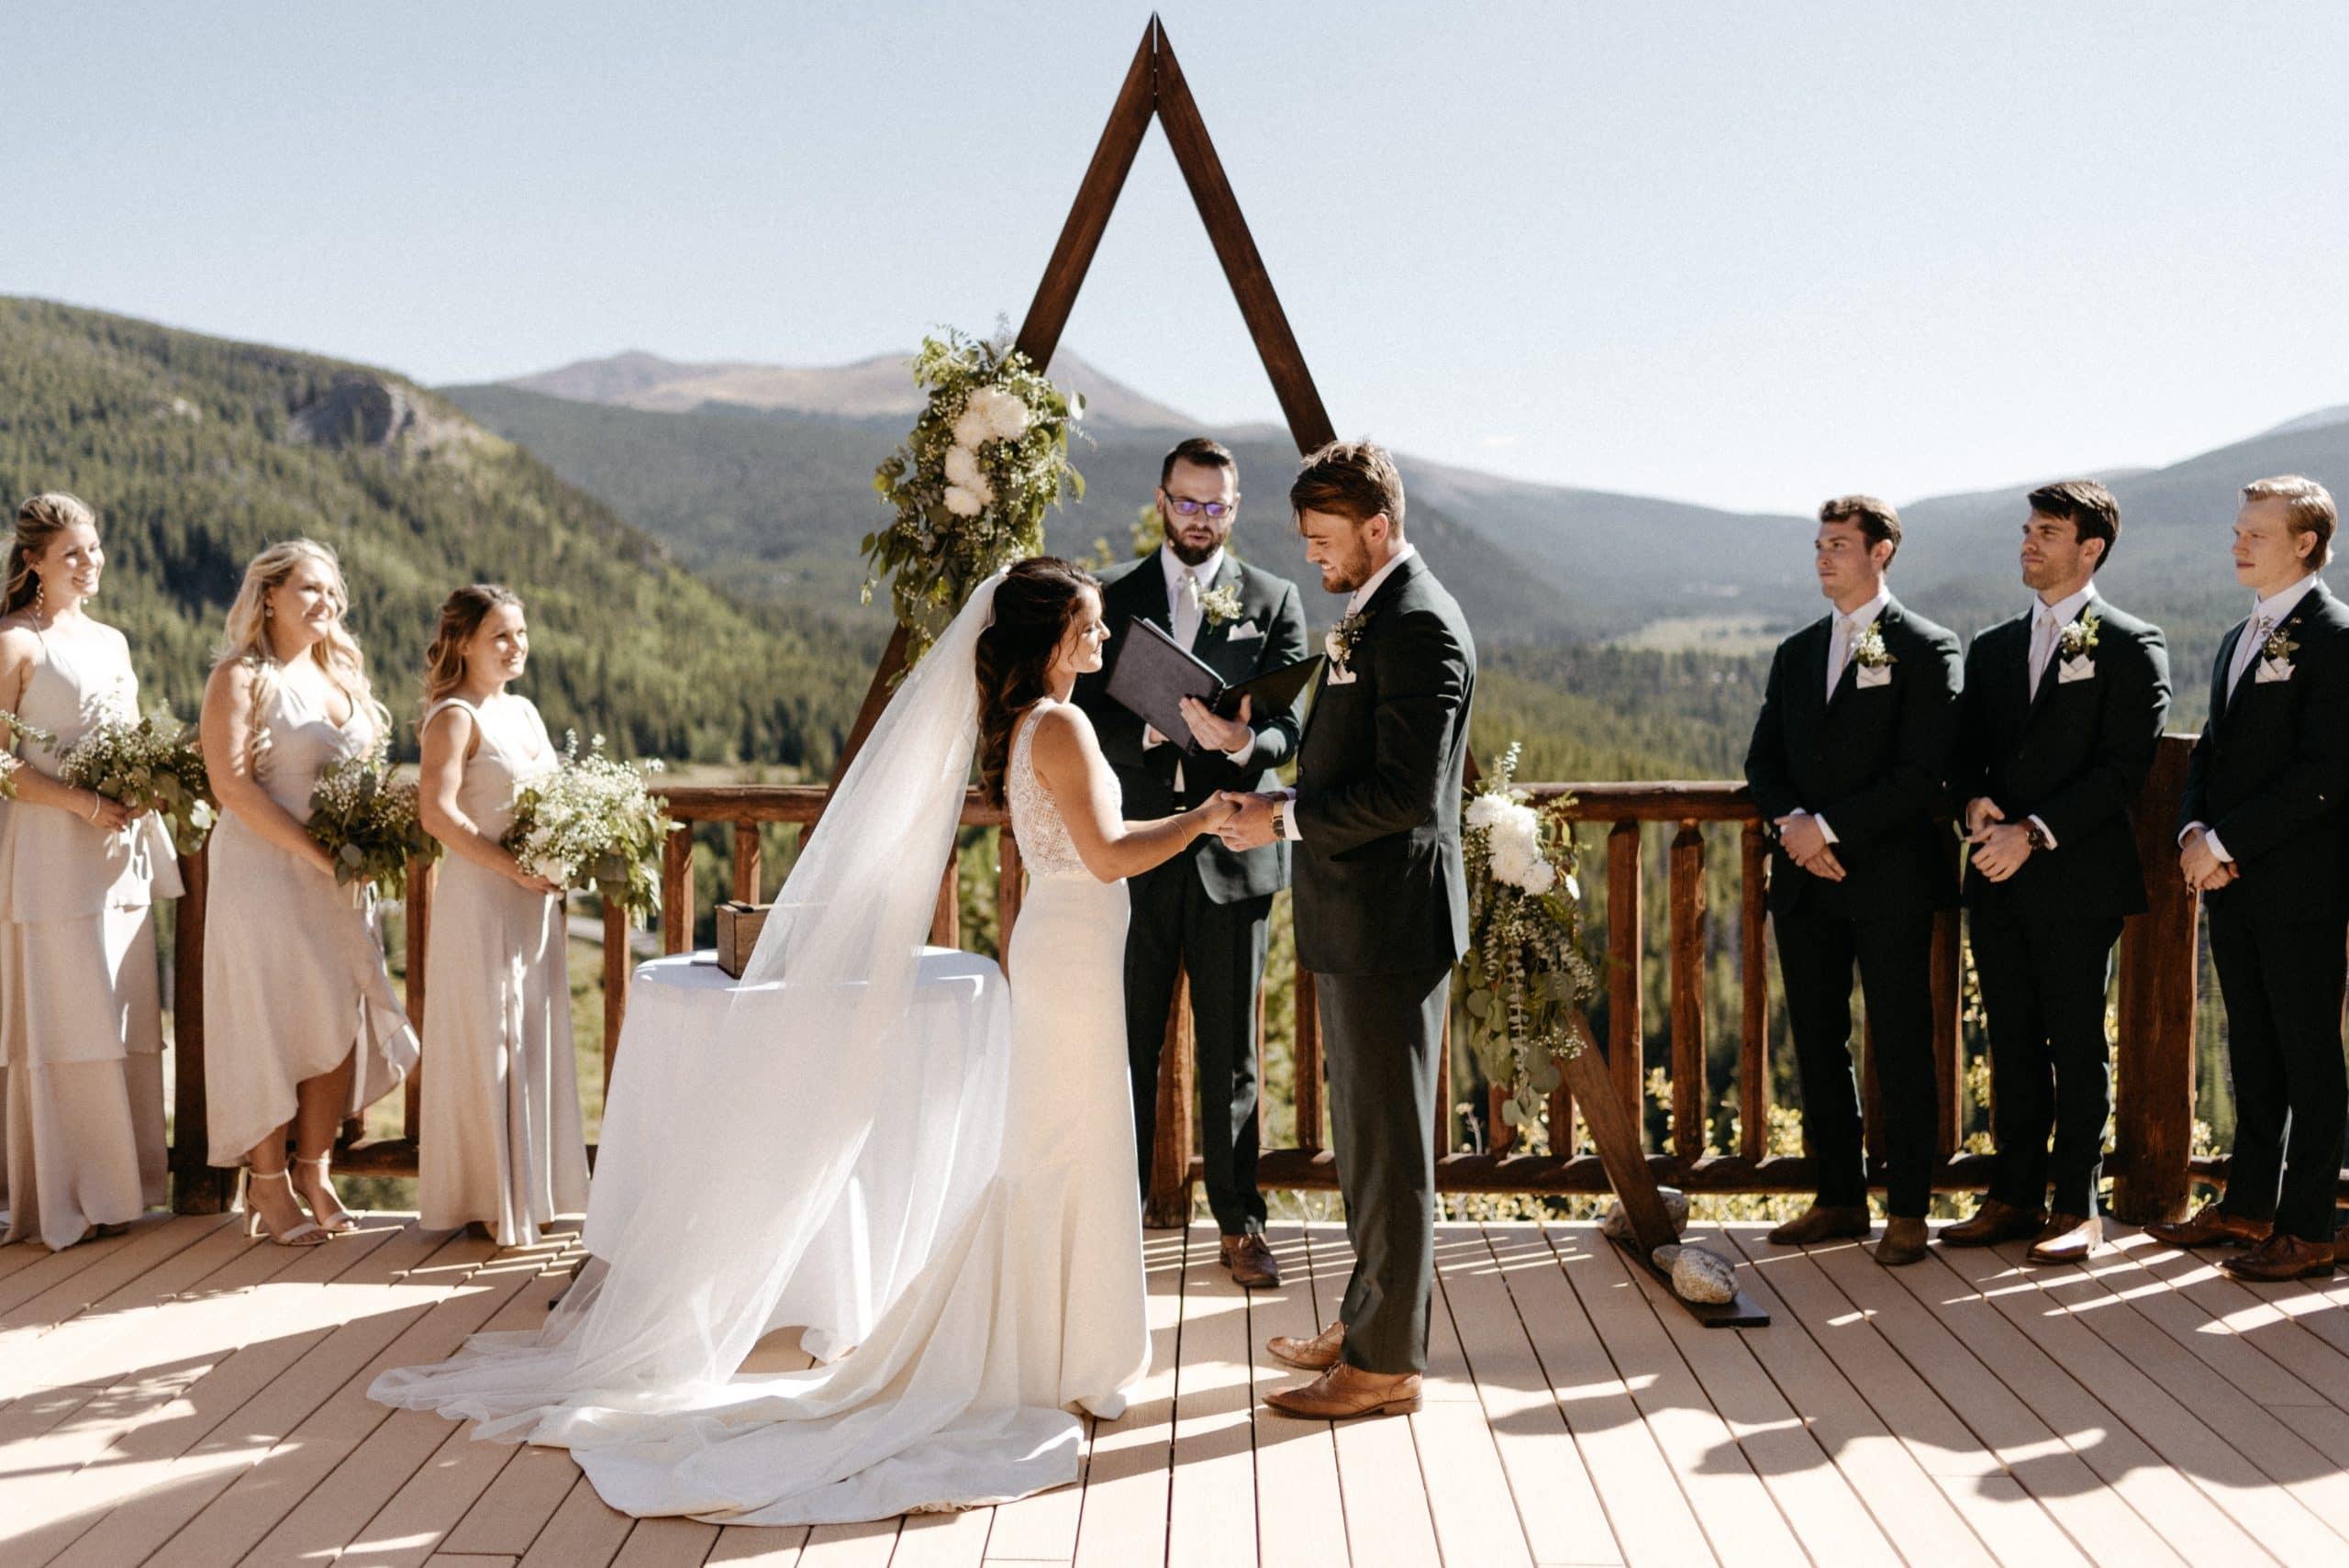 Lodge at Breckenridge Wedding Venue